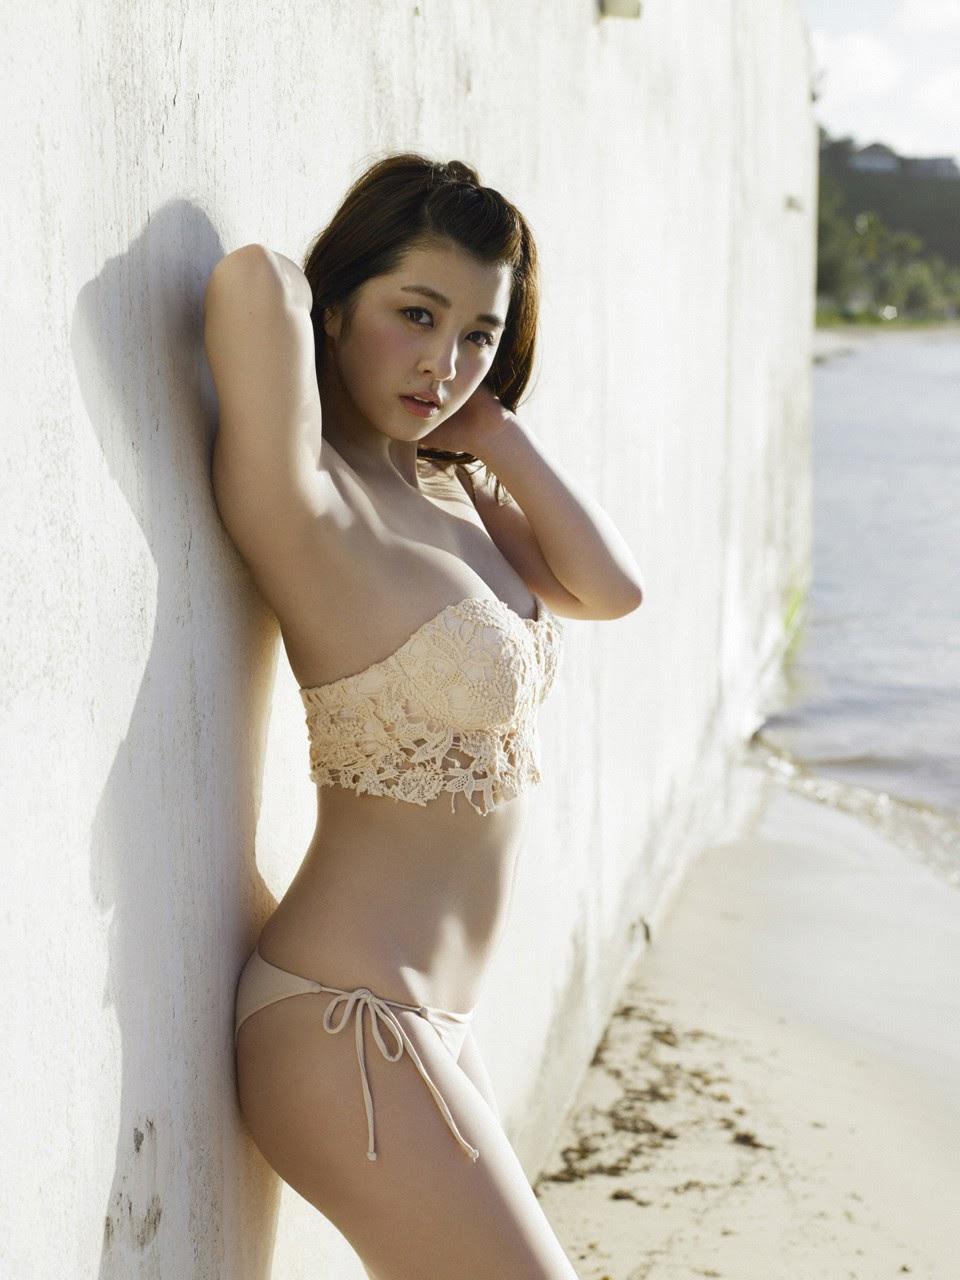 Bikini on a white sandy beach061